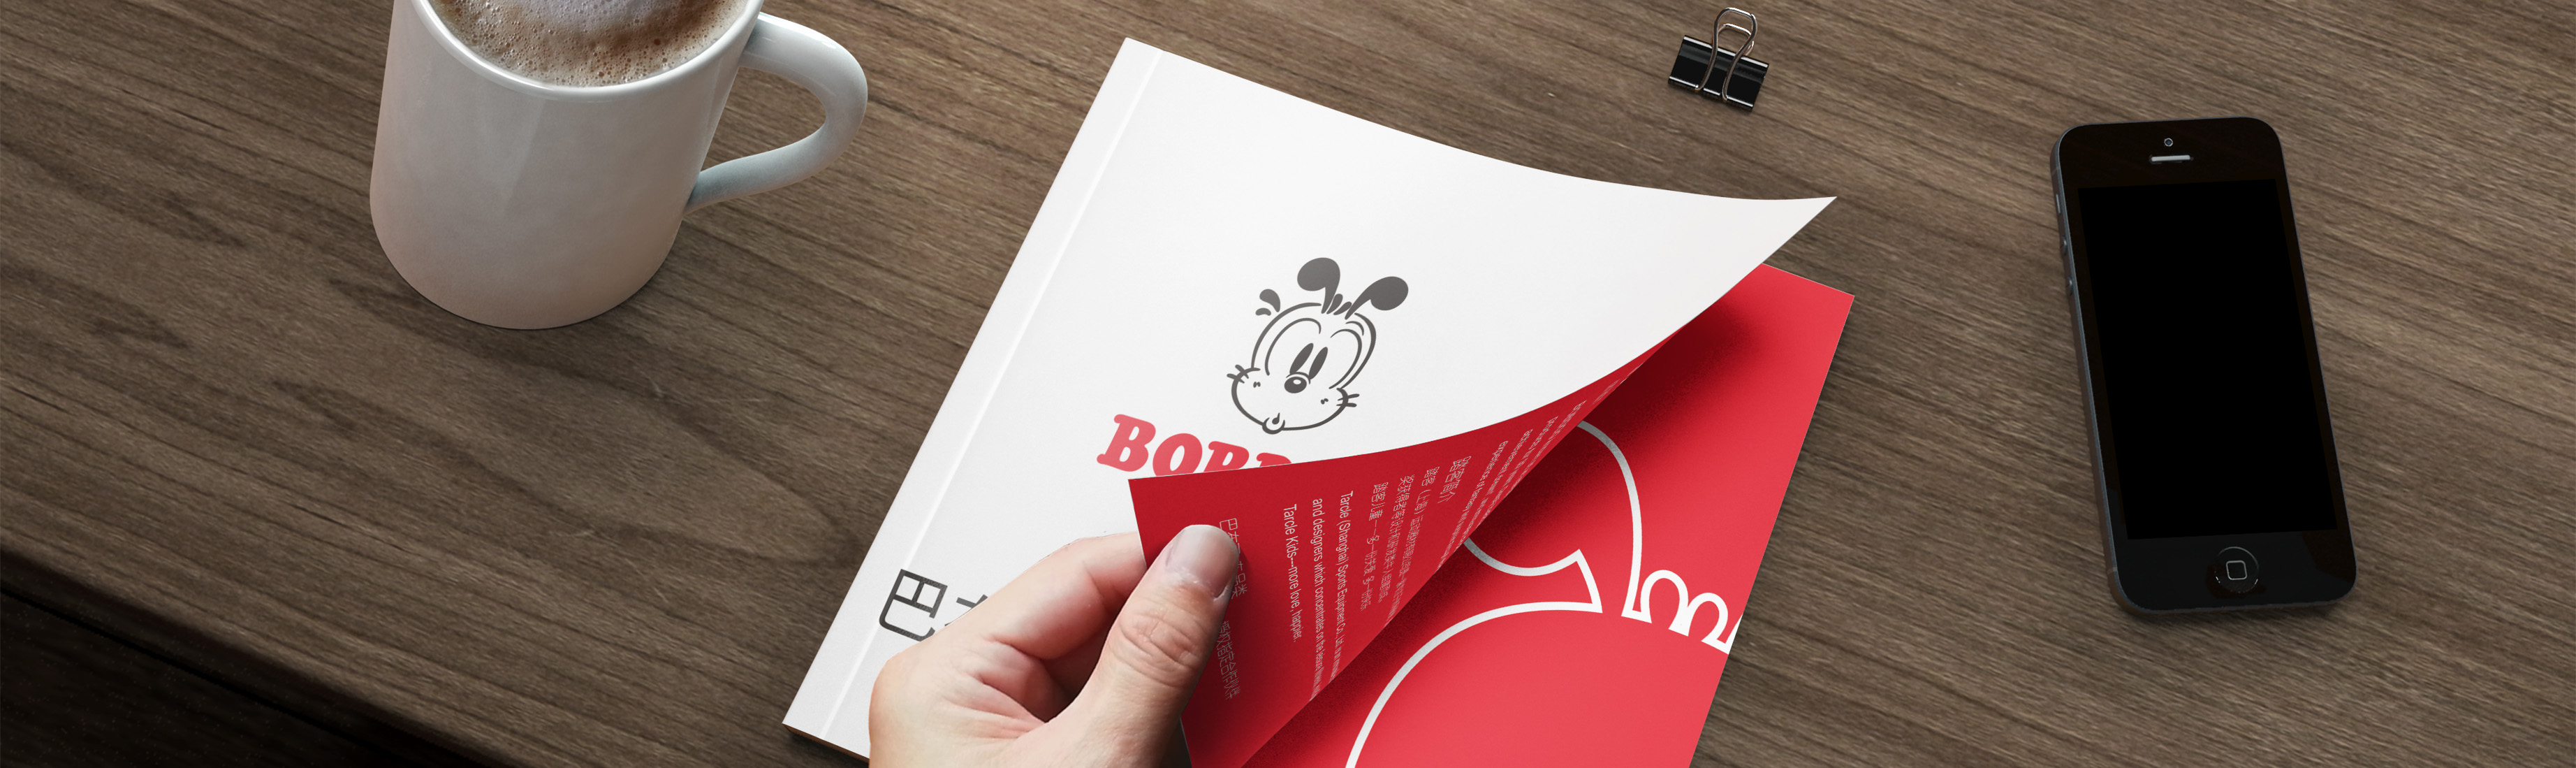 SSC设计-巴布豆画册设计